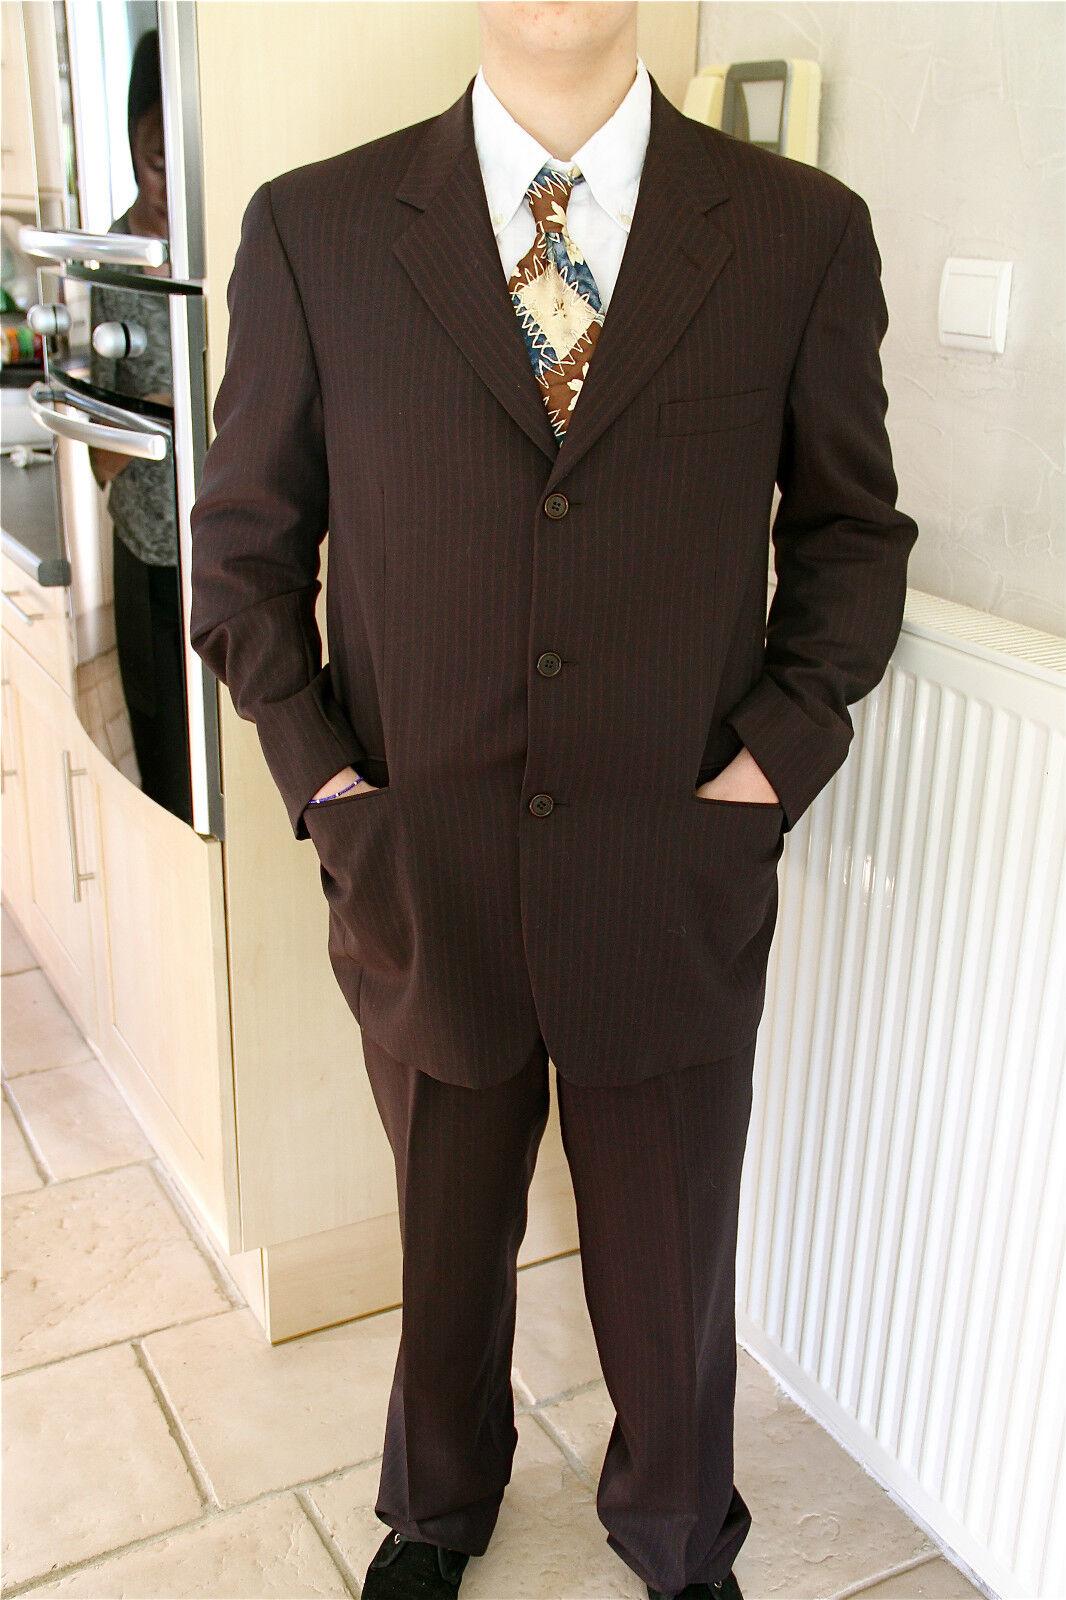 Abito lana luxe grigio a strisce bordeaux CERRUTI 1881 giacca T 52 pantaloni